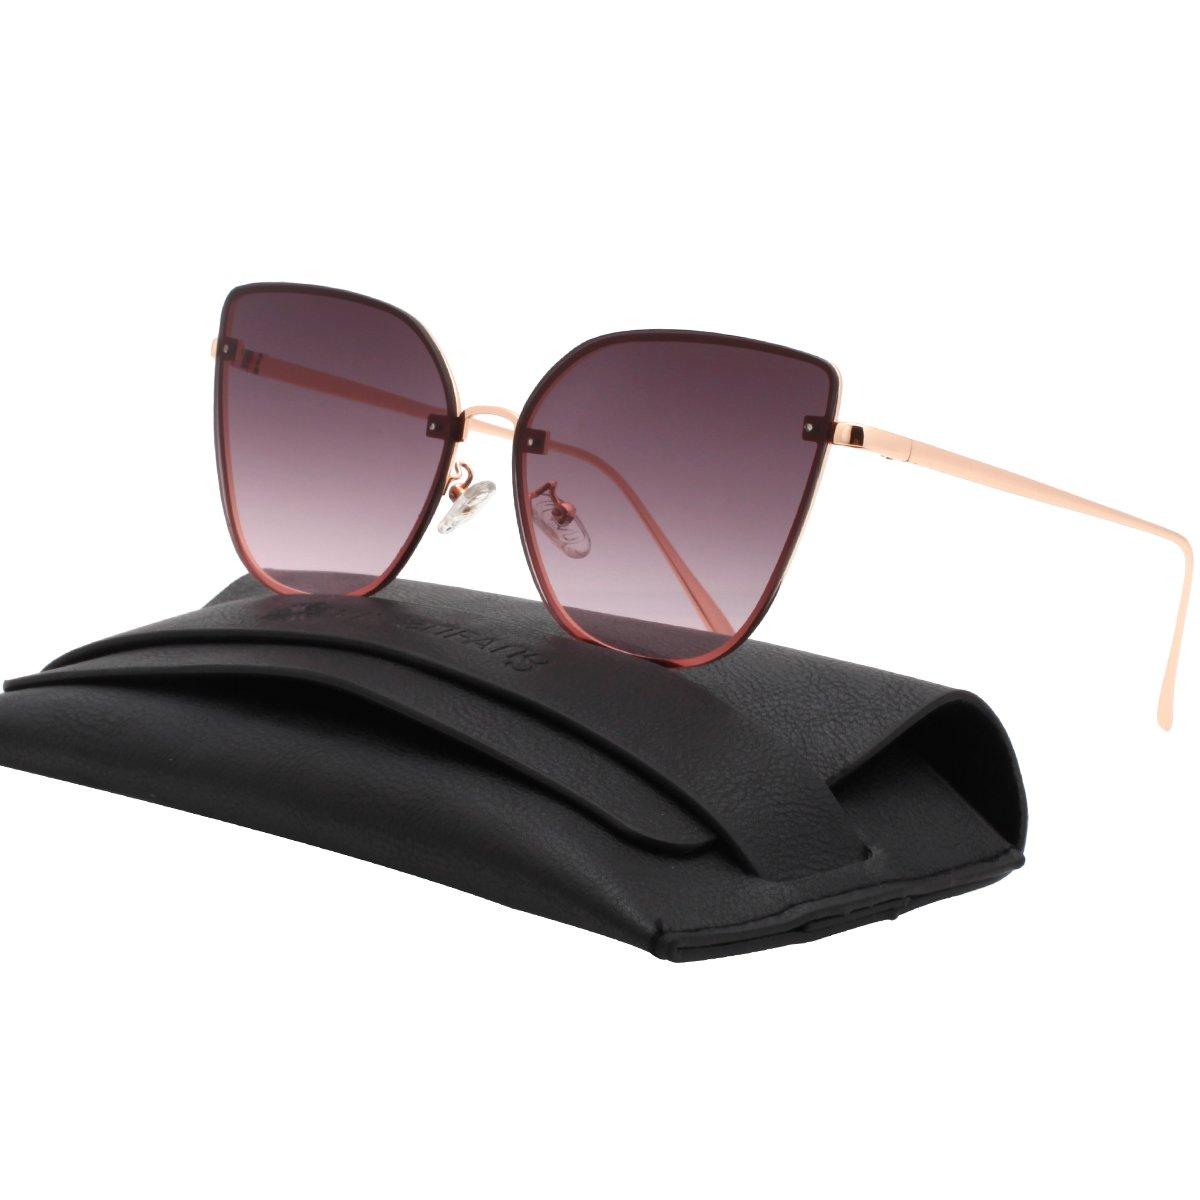 VIVIENFANG LEXI Flat Lens Rimless Sunnies Mirrored Aviator Sunglasses For Unisex G87027A Ocean Lens